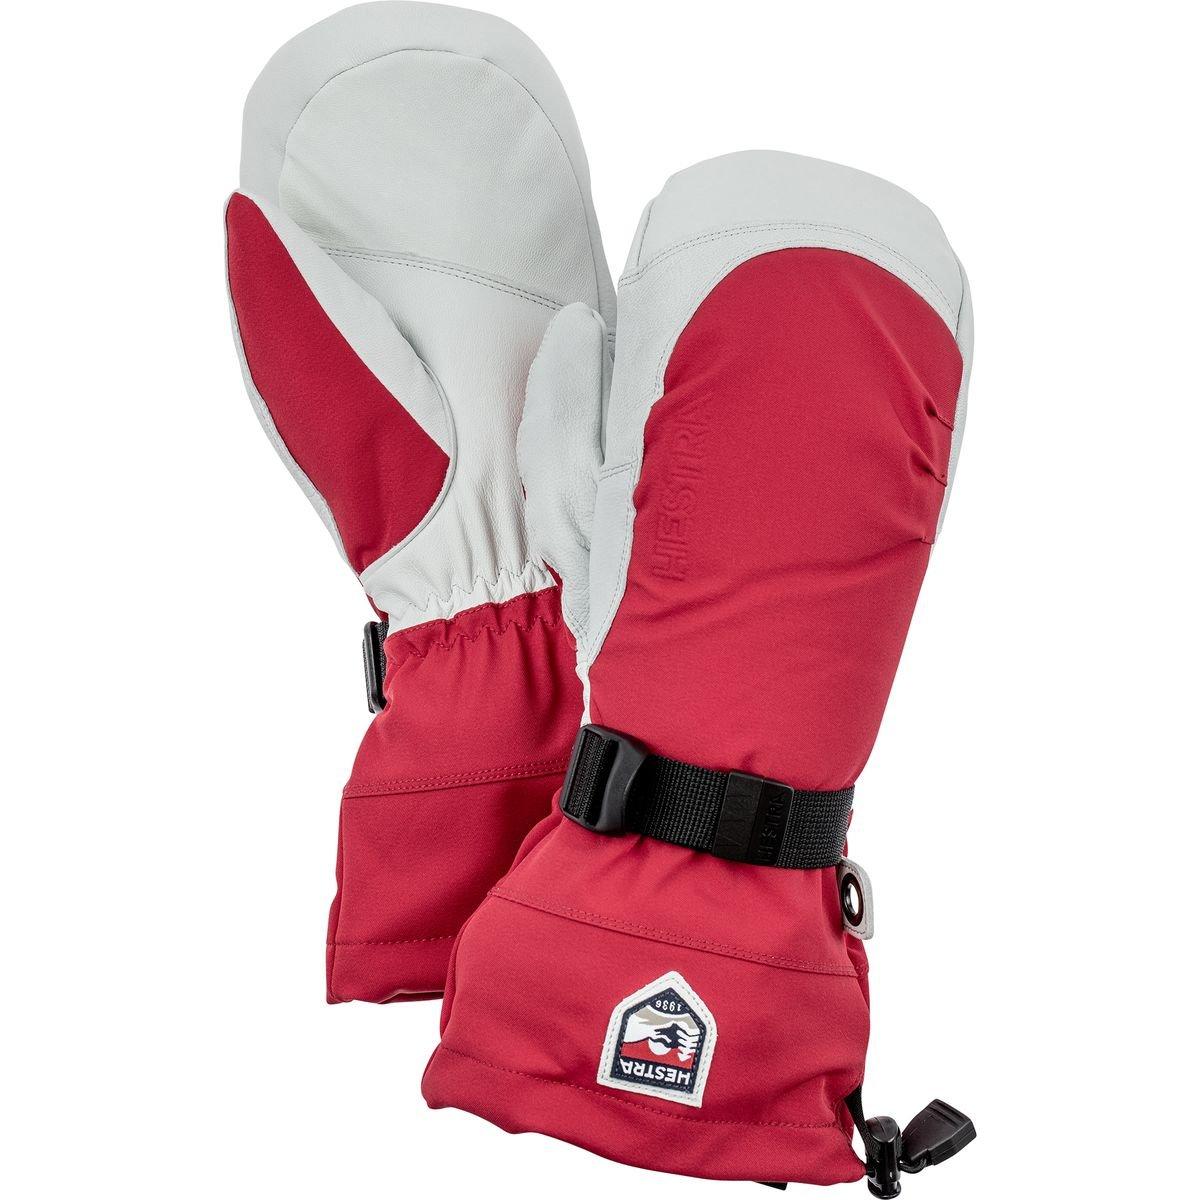 Hestra Army Leather Extreme Mitt Hestra Gloves 35161